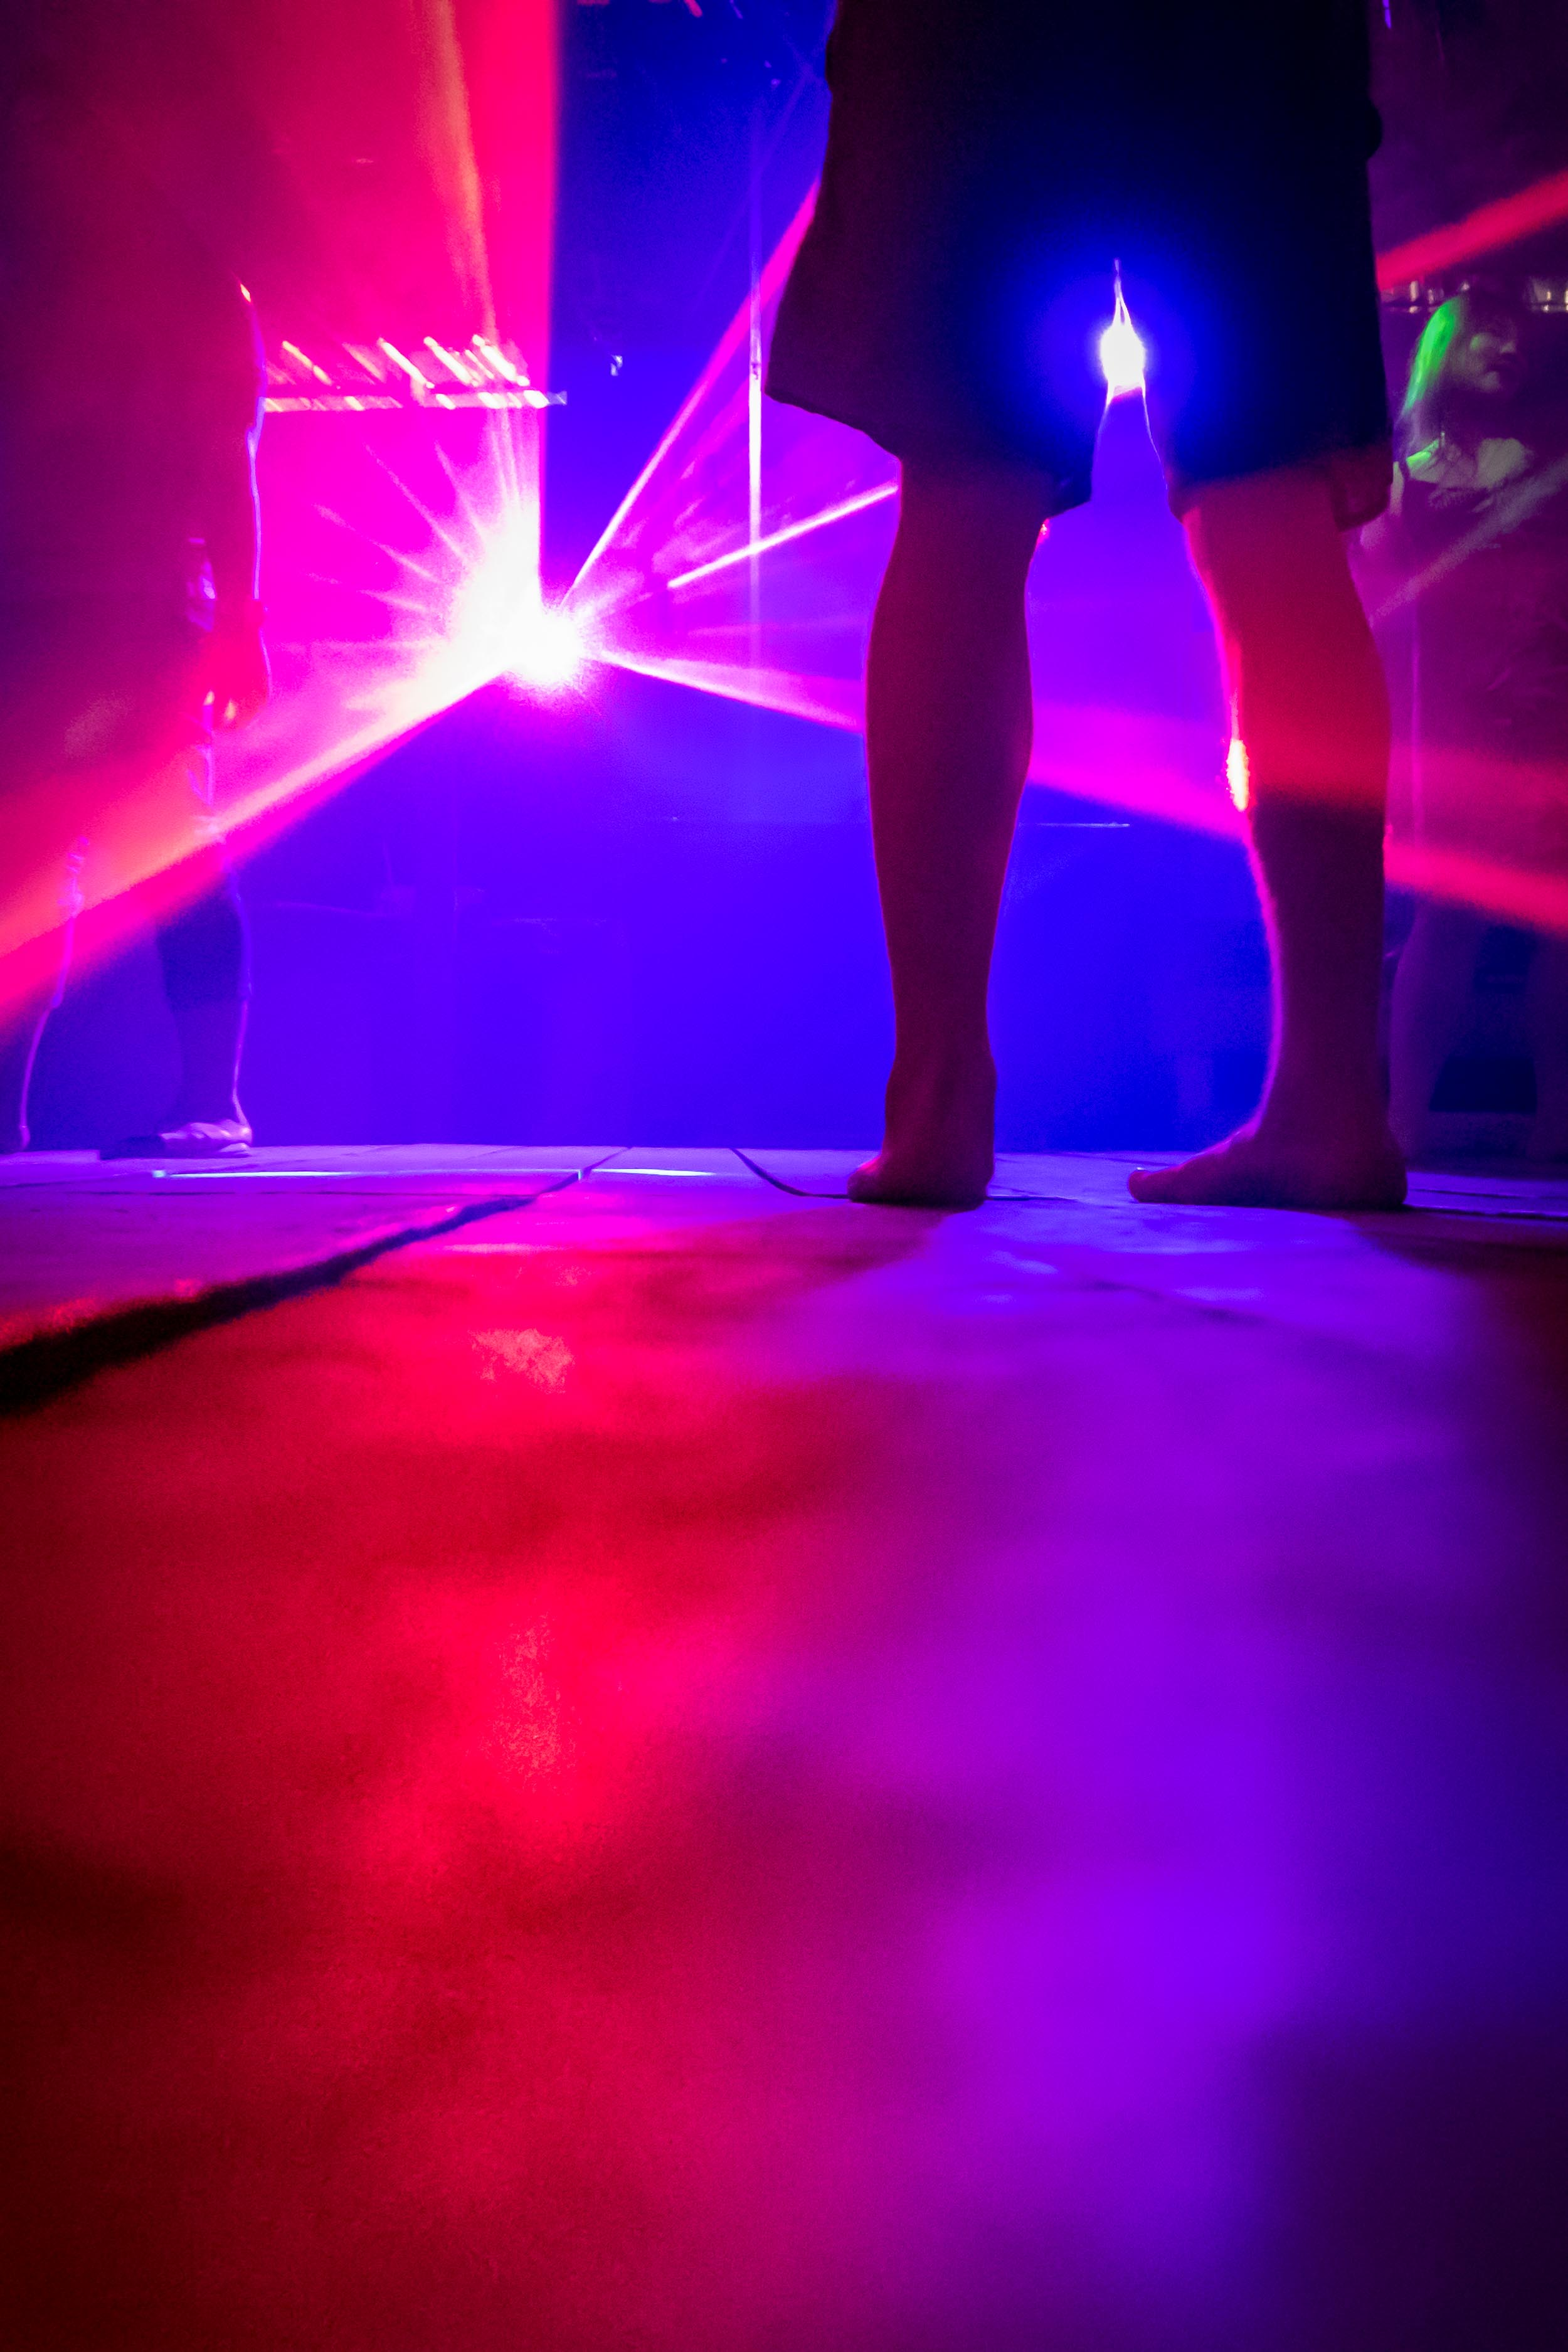 Rupert Turkington, Travel Photo - Ting Tong Nightclub, Koh Chang, Thailand.